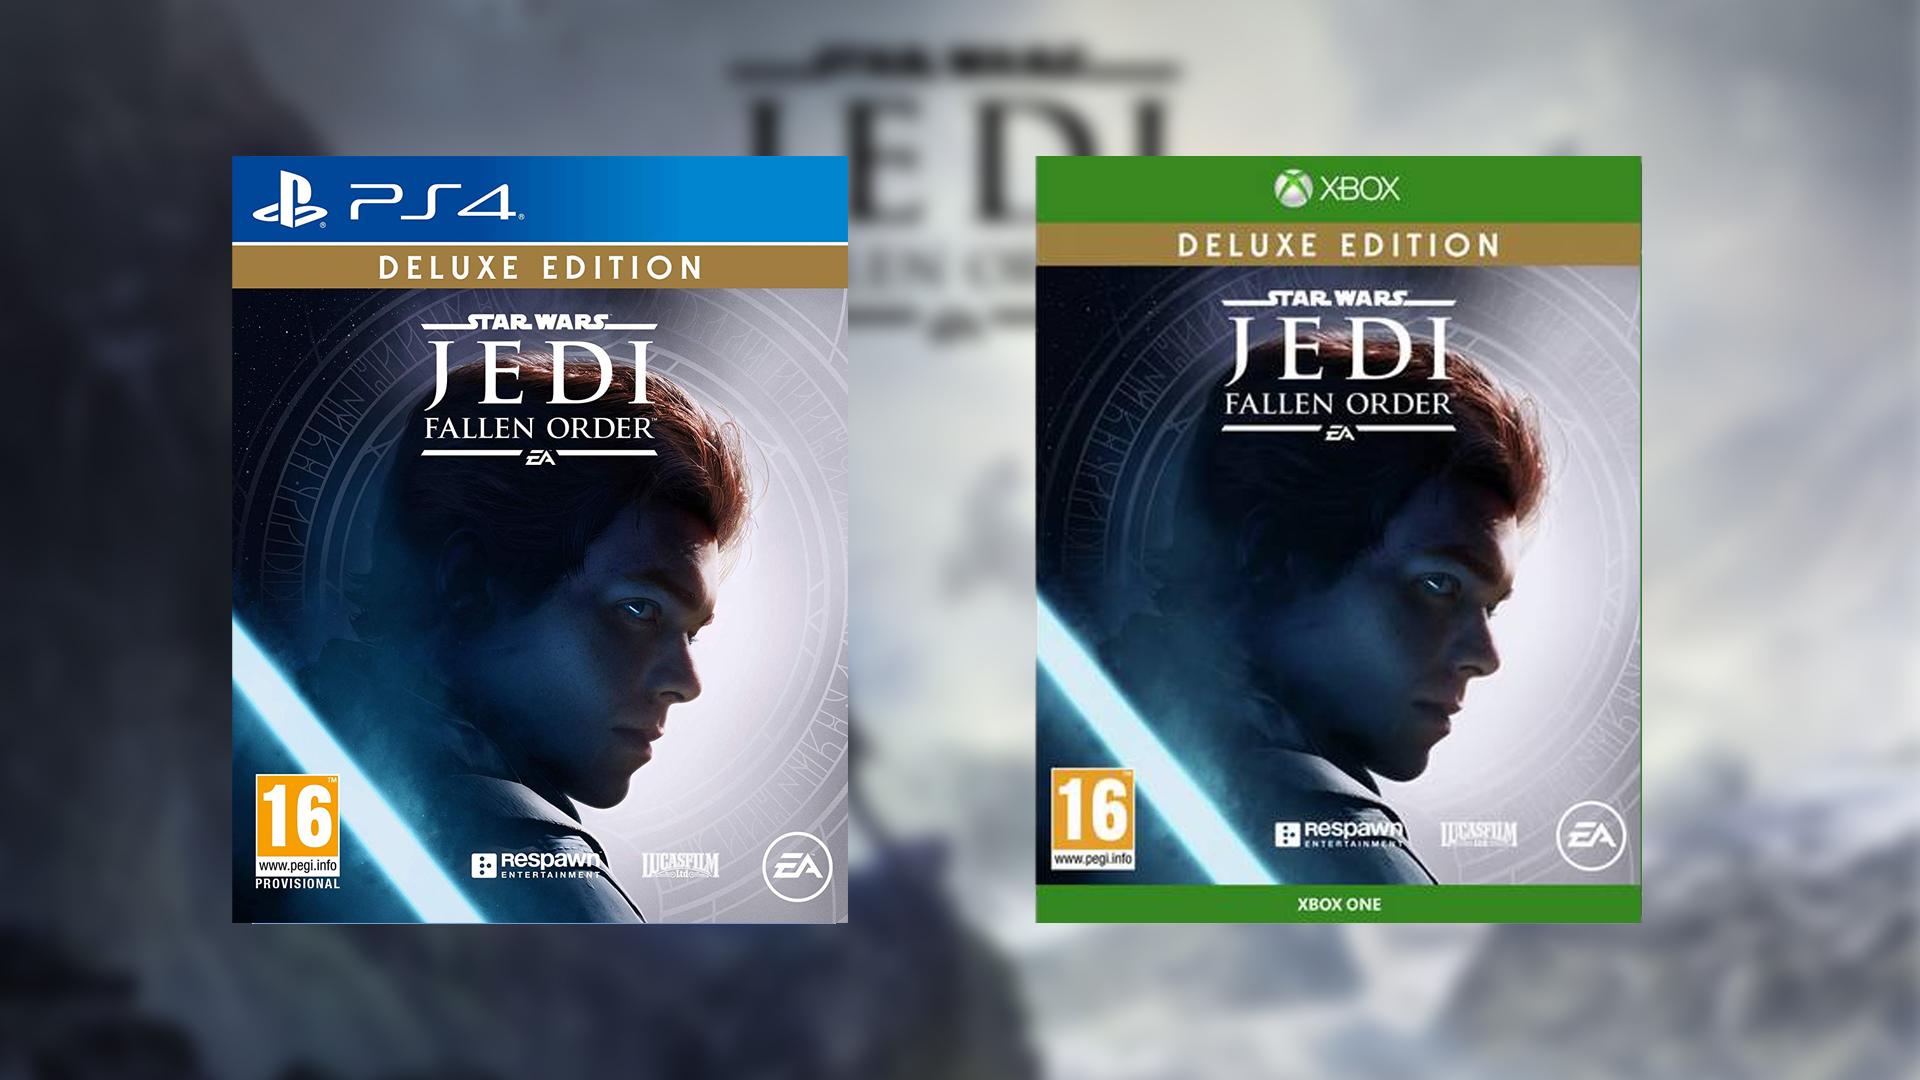 Préco Star Wars Jedi Fallen Order Deluxe